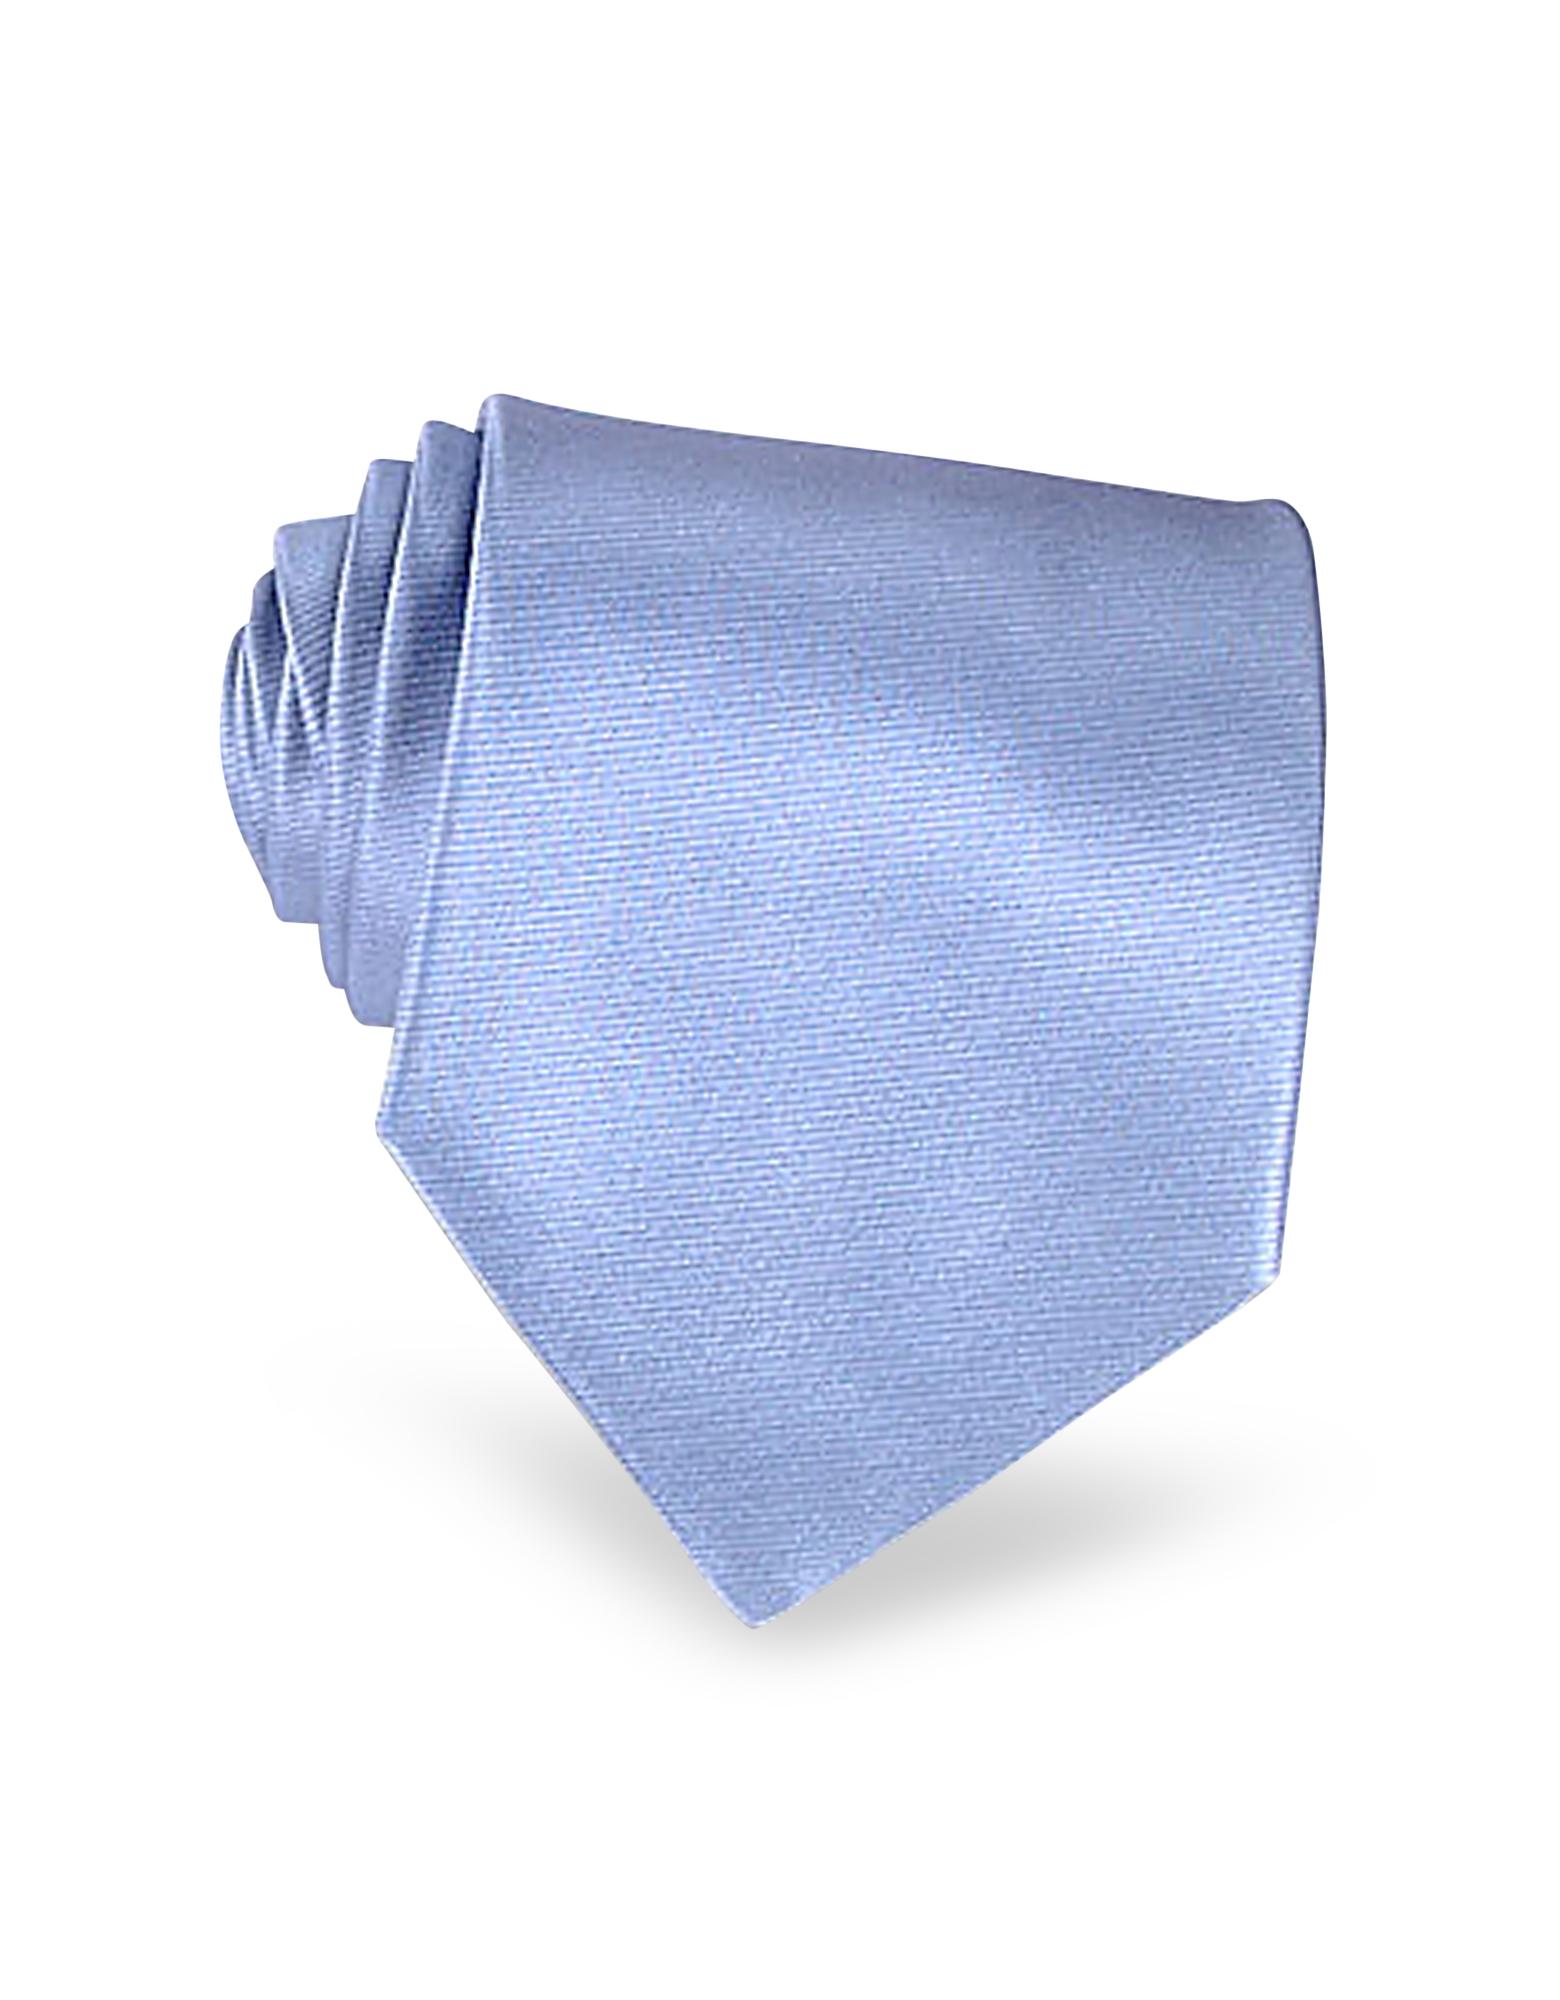 Shimmering Solid Sky Blue Textured Silk Tie